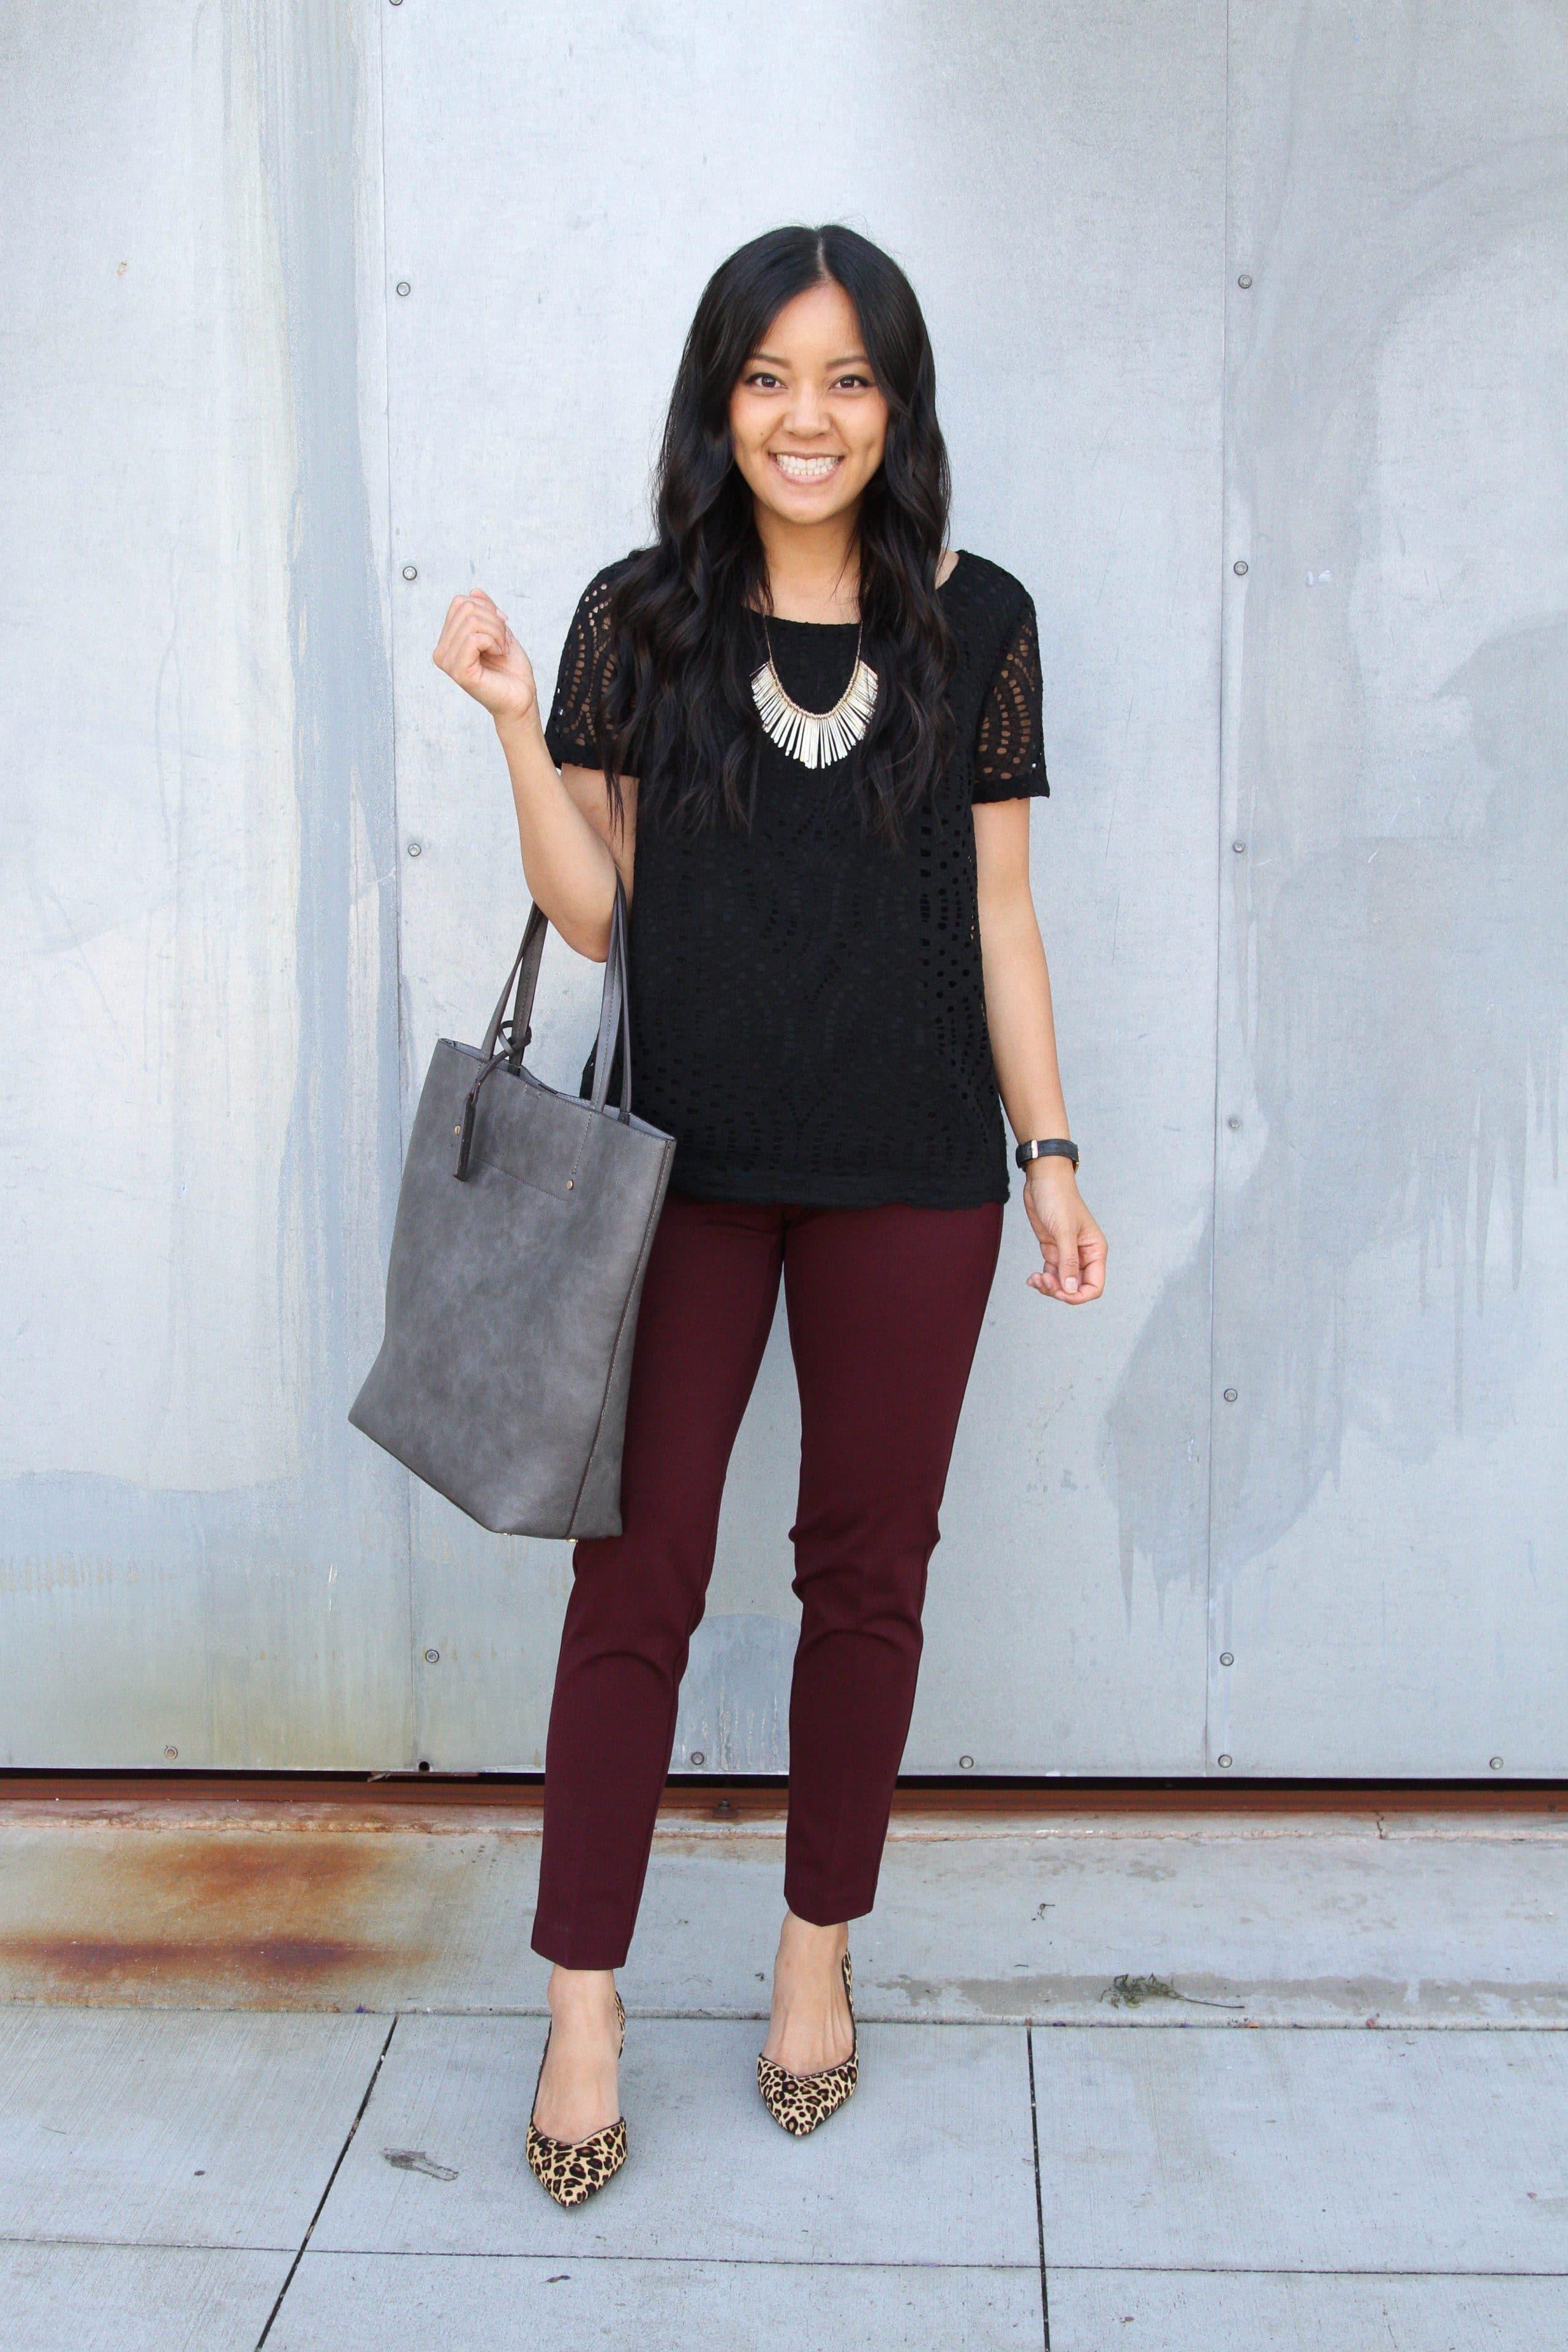 black lace top + maroon pants + leopard print heels + grey tote + statement necklace